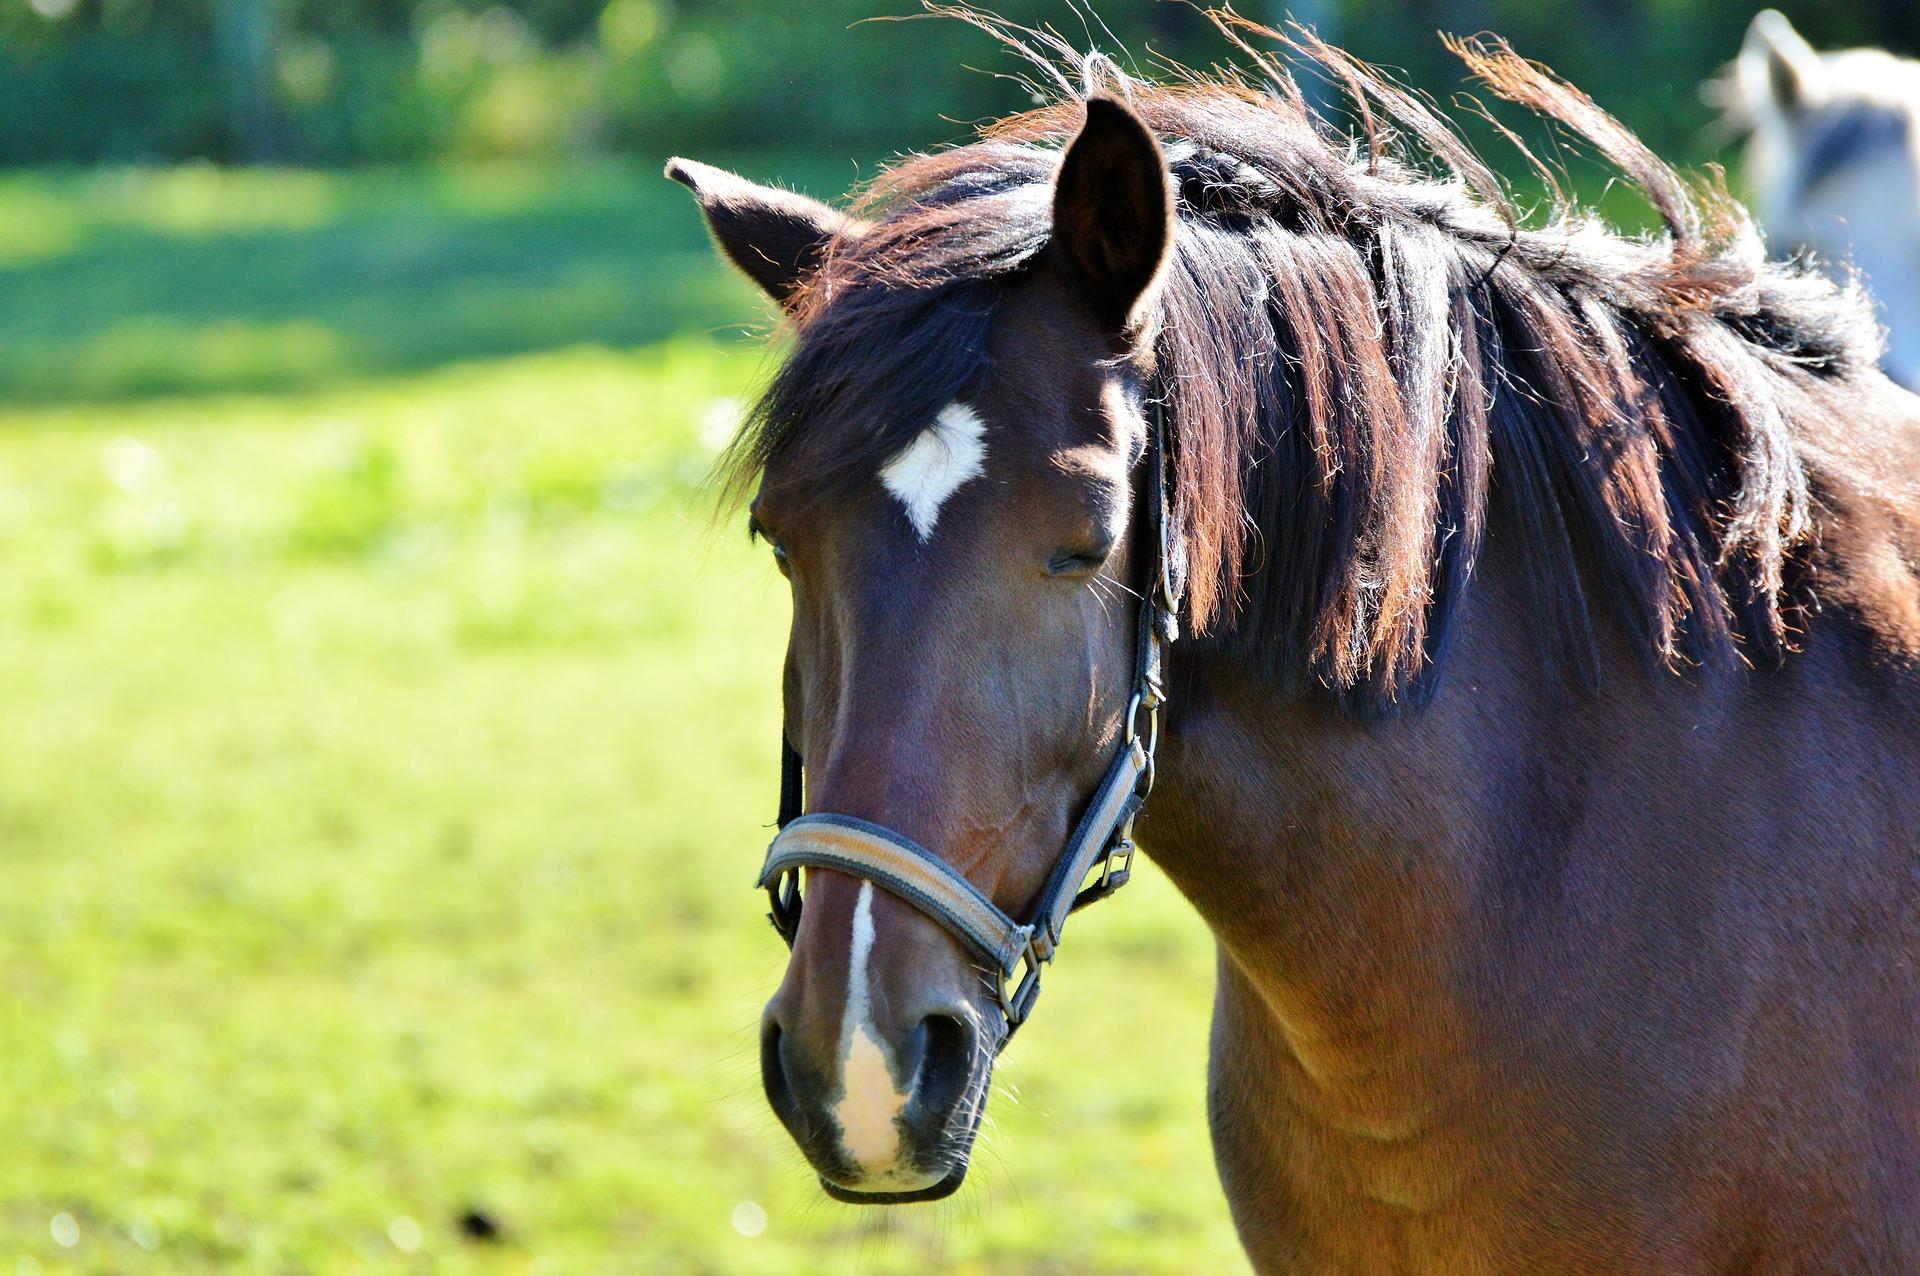 horse-2820376_1920